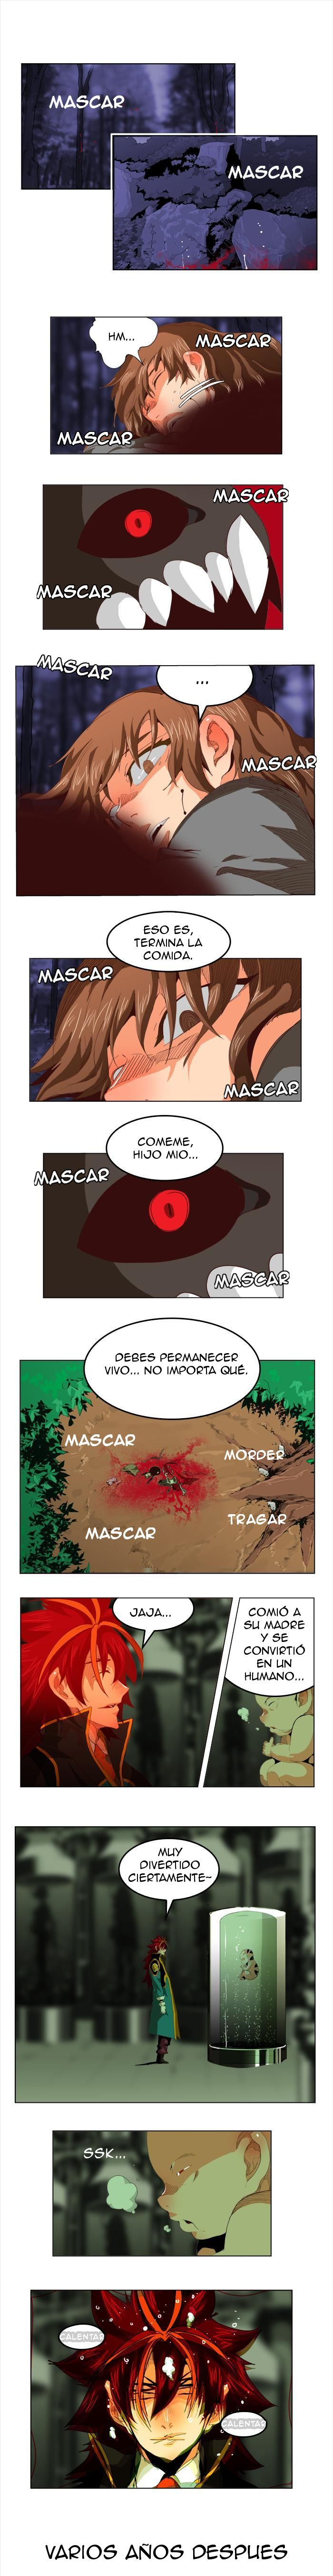 http://c5.ninemanga.com/es_manga/pic2/37/485/488888/4ad4ac5d24d3701c6387faa0c6a57107.jpg Page 6